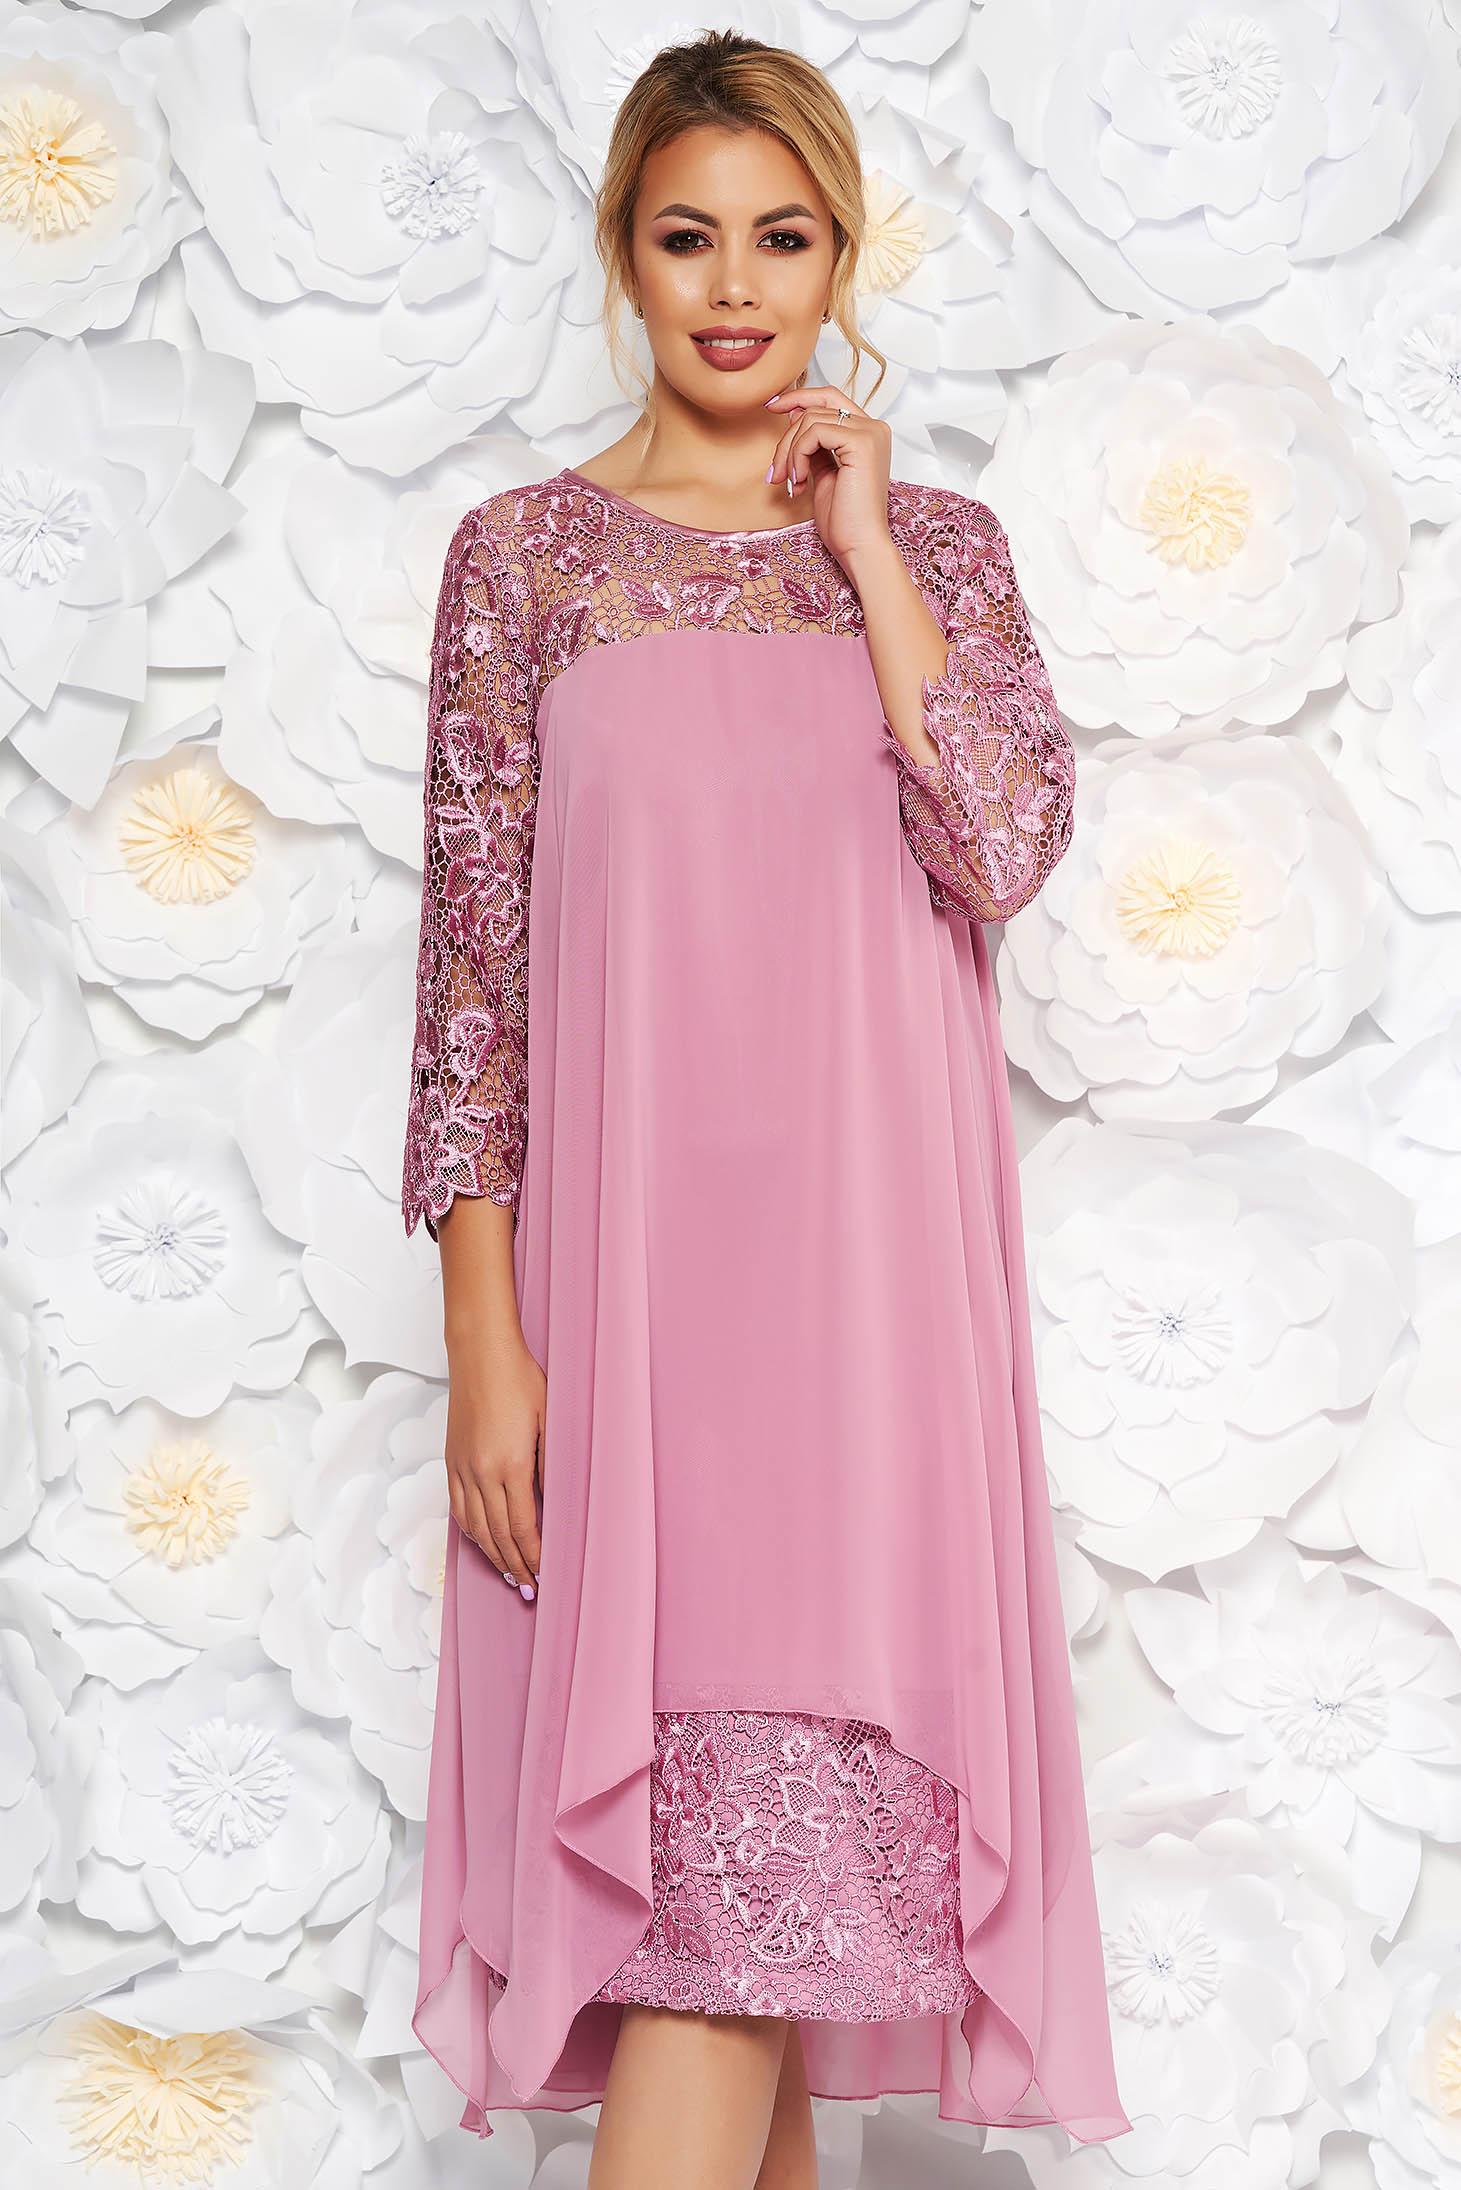 Rochie roz deschis de ocazie din voal cu un croi drept si maneci din dantela